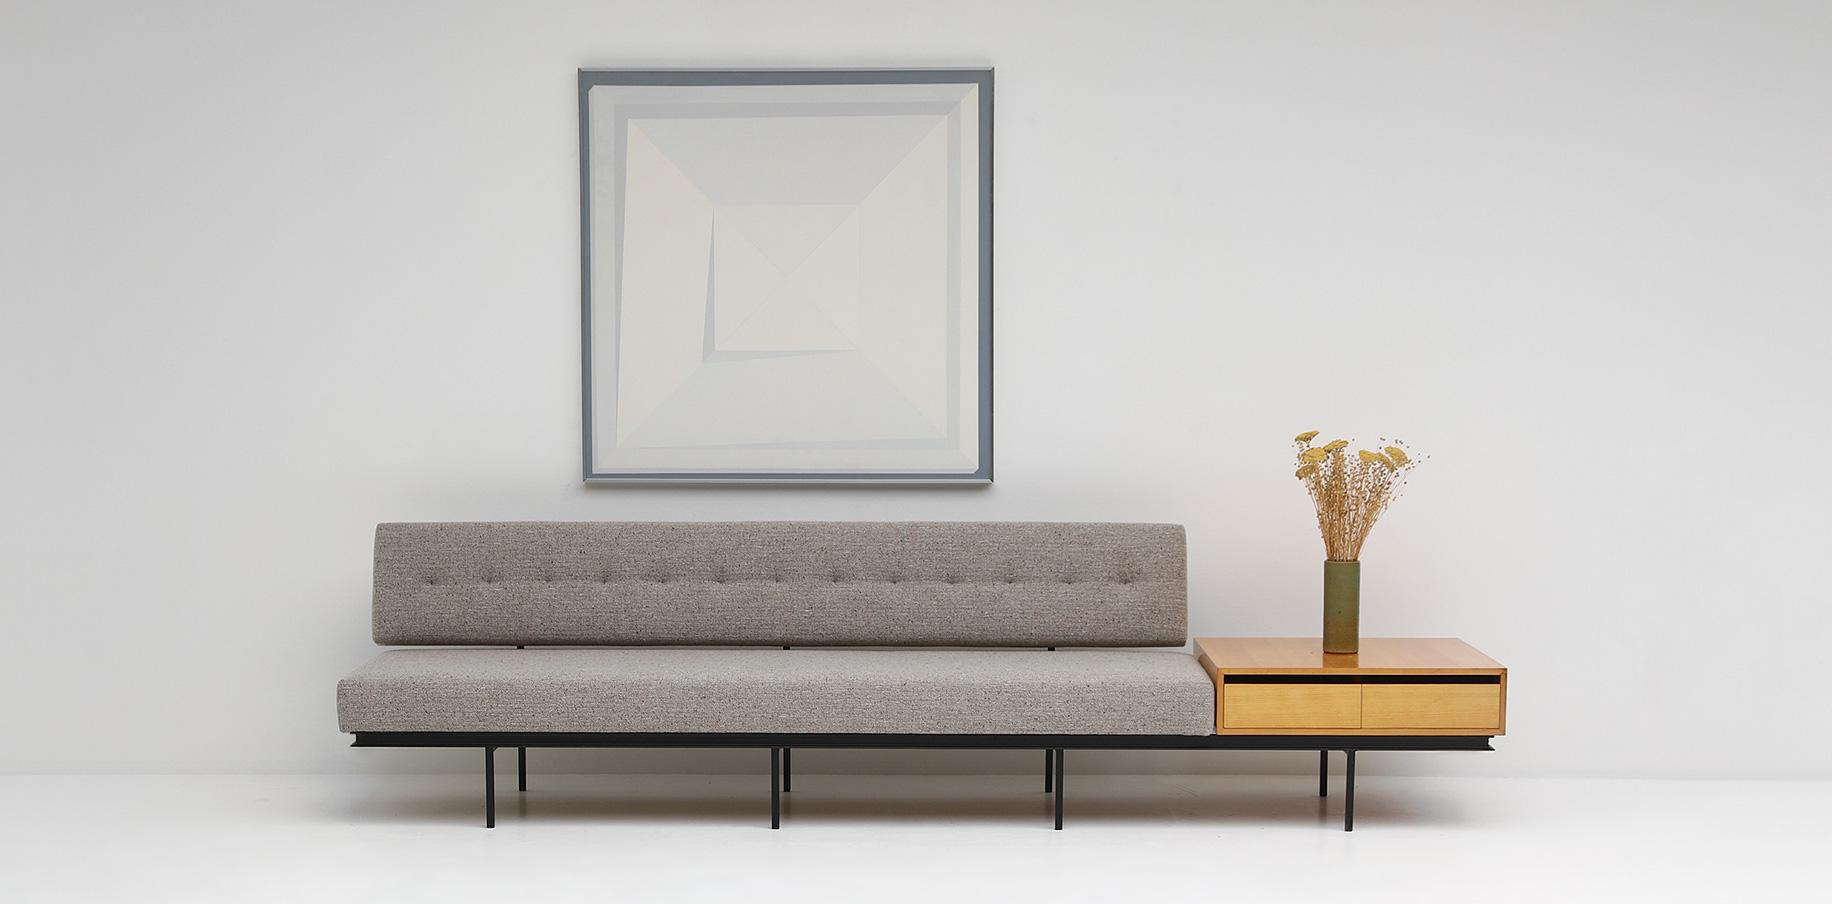 City furniture highlight 2